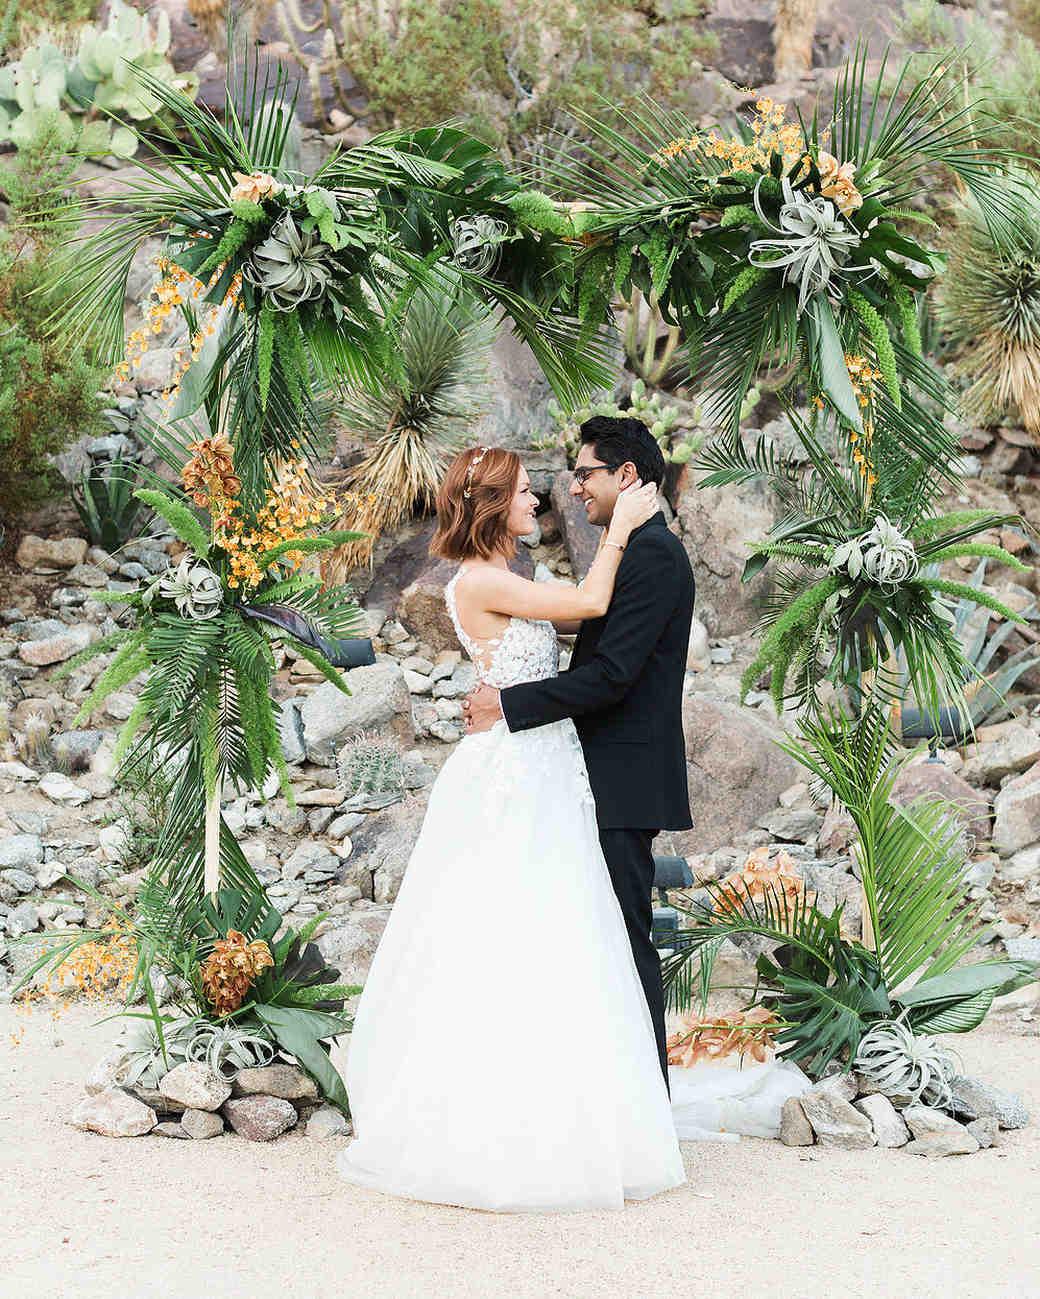 emily adhir wedding couple embrace